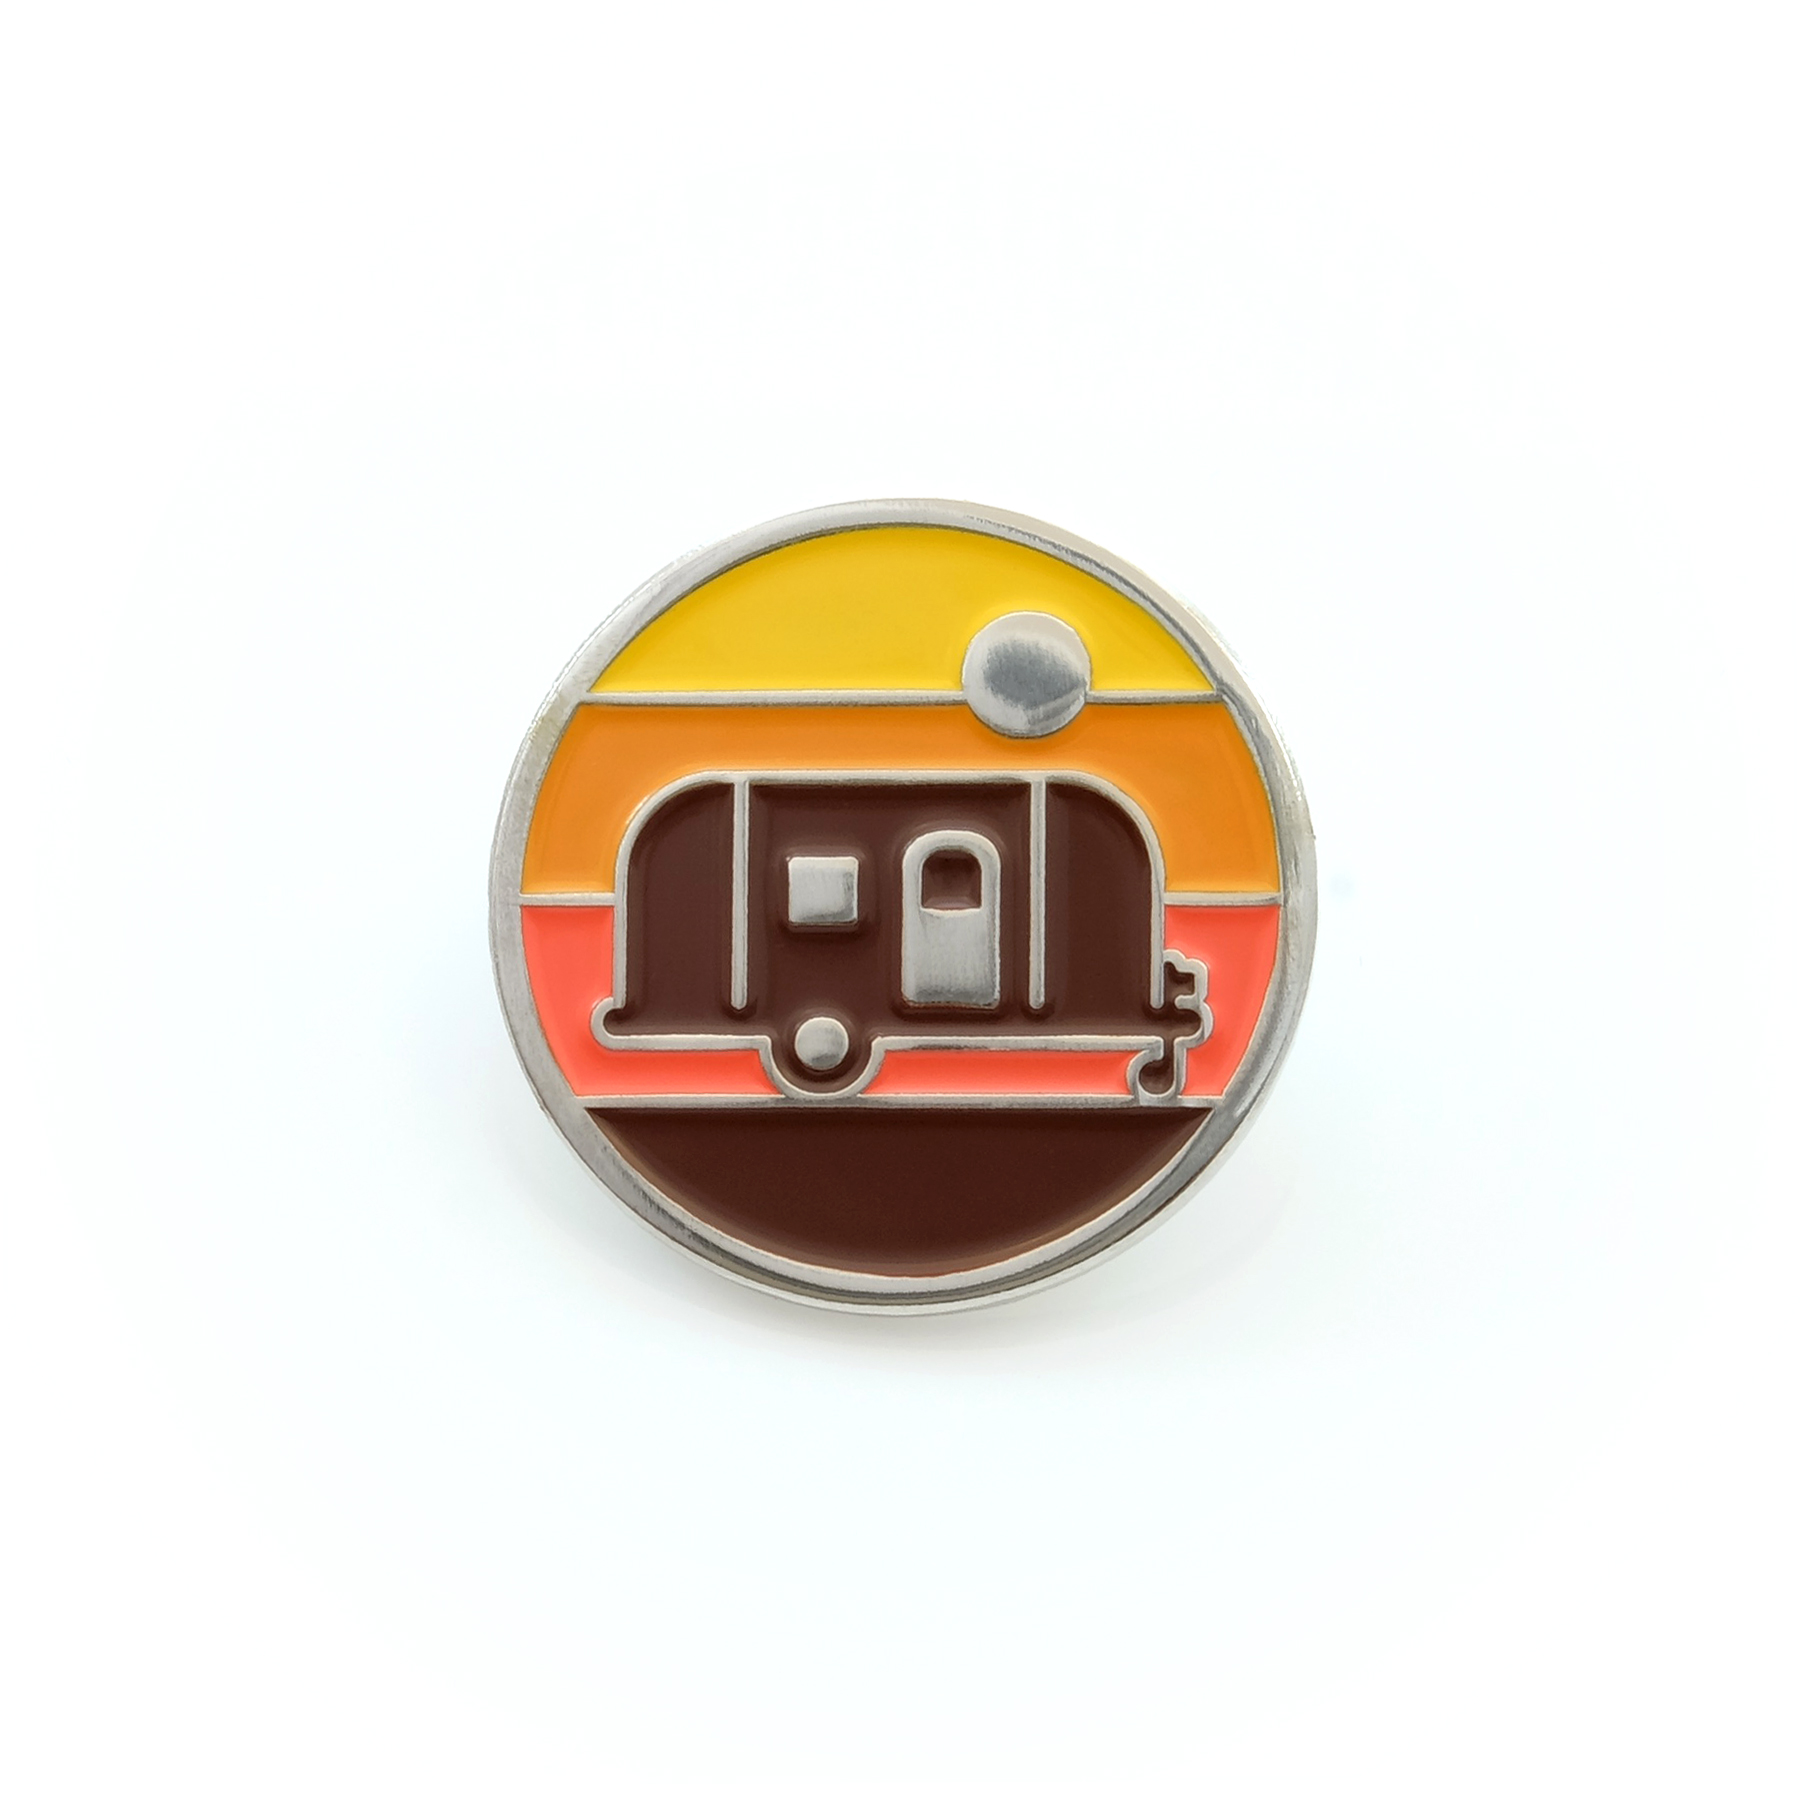 Explorers Club Enamel Pins by DKNG